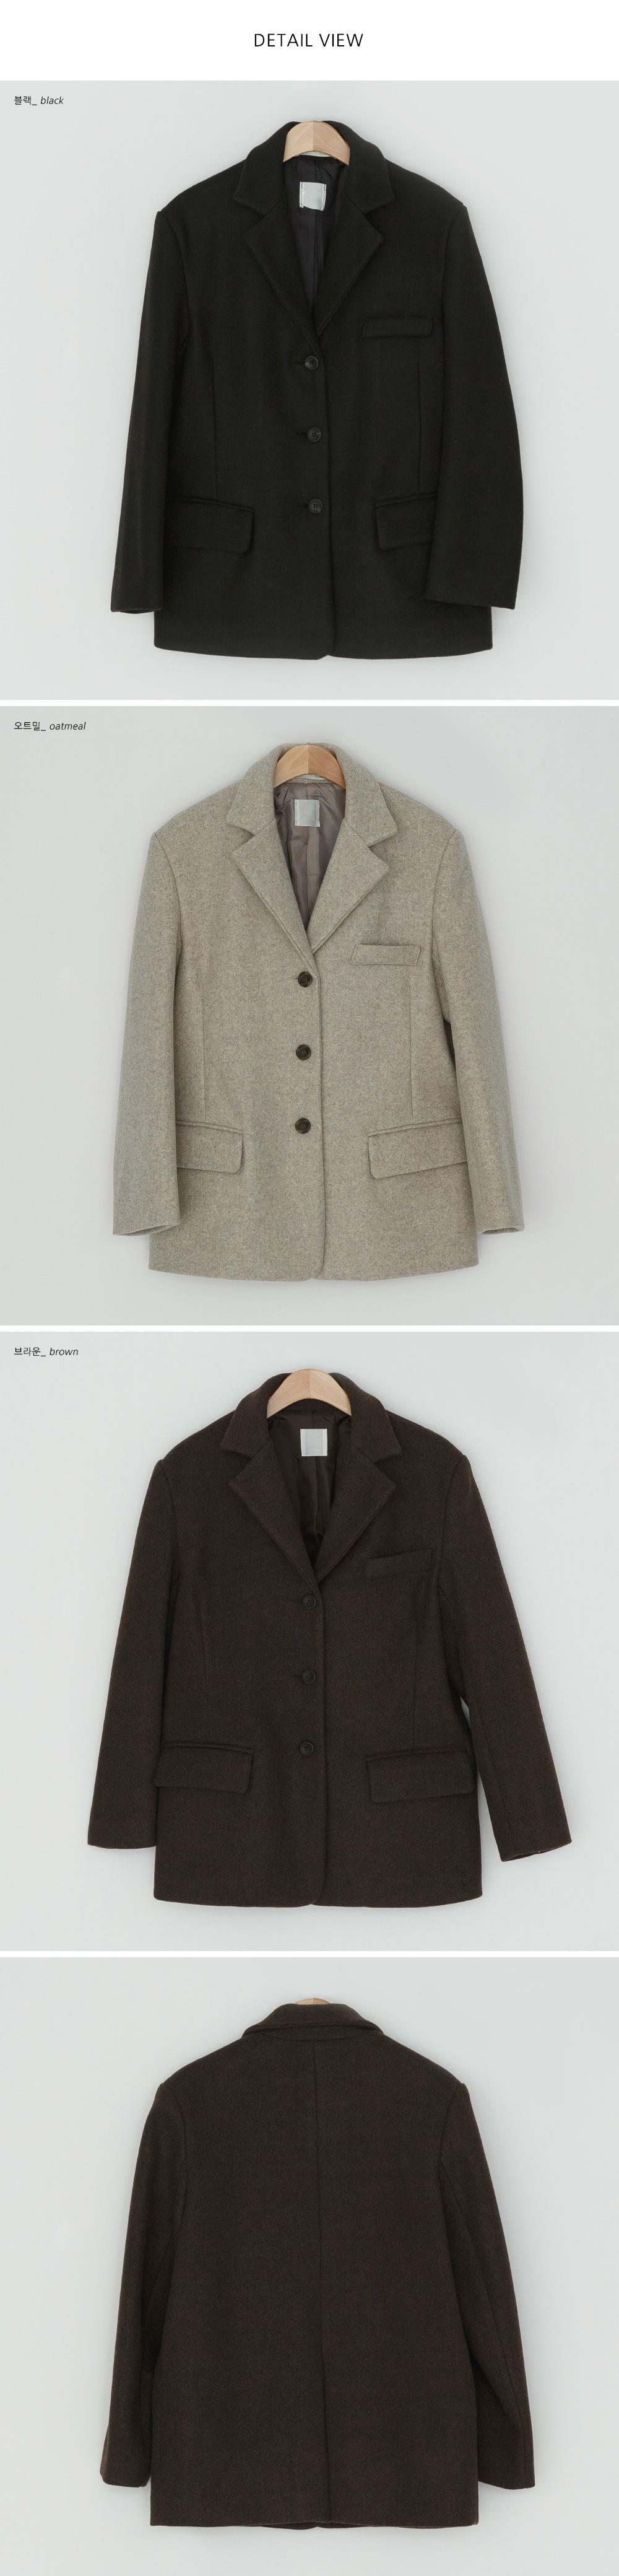 Manish single wool jacket-jk